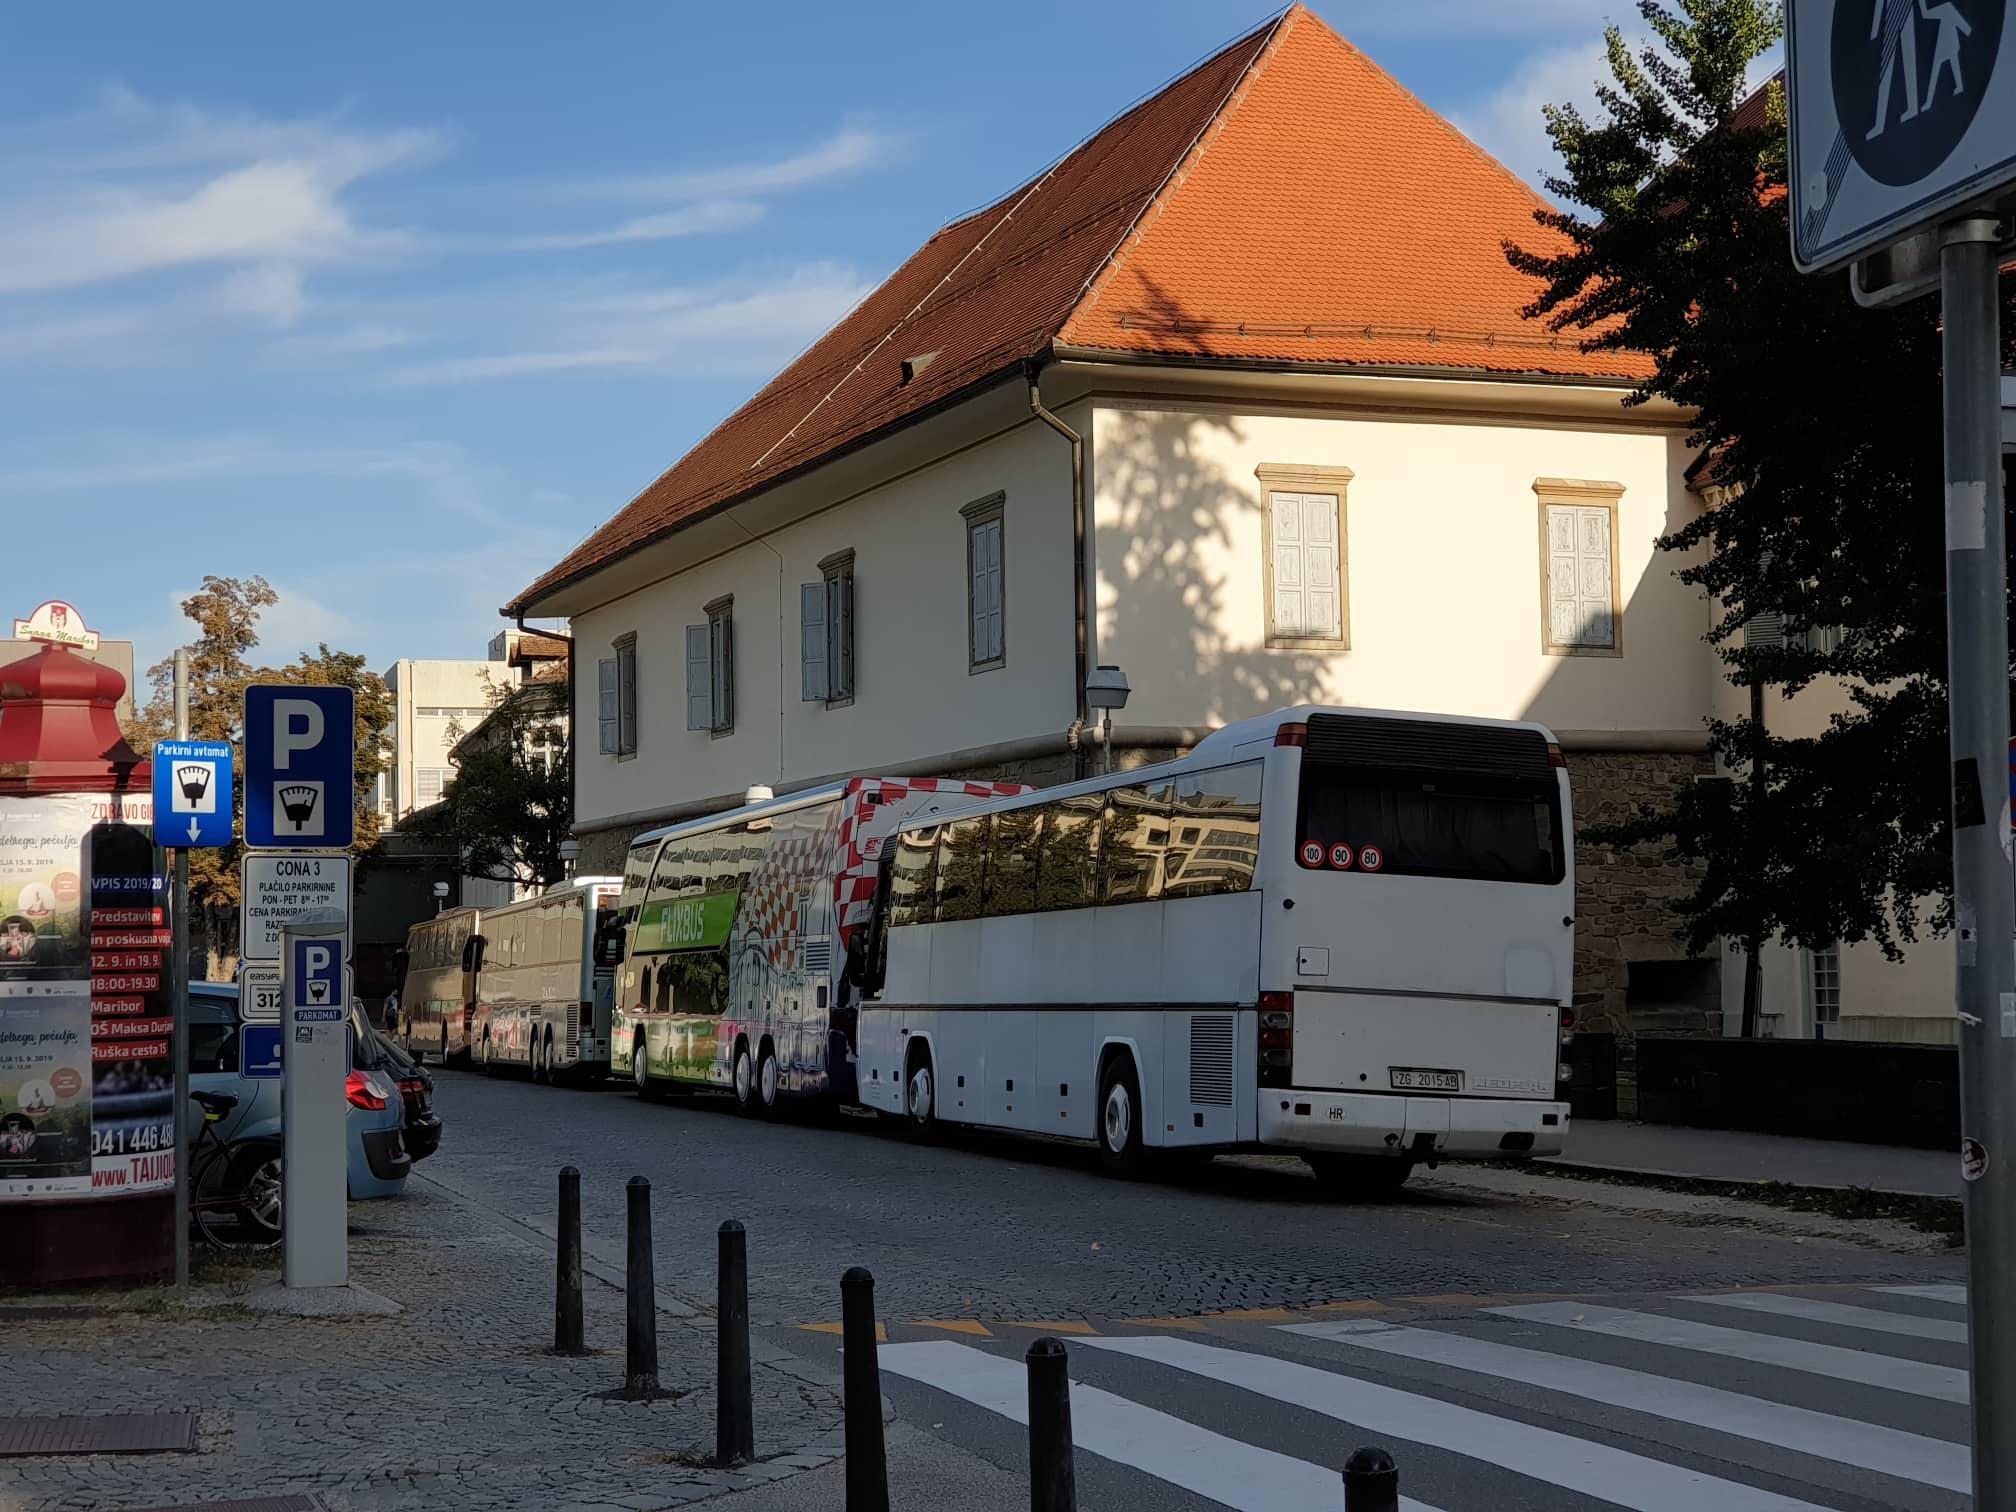 Pobuda za ureditev parkiranja turističnih avtobusov v Mariboru